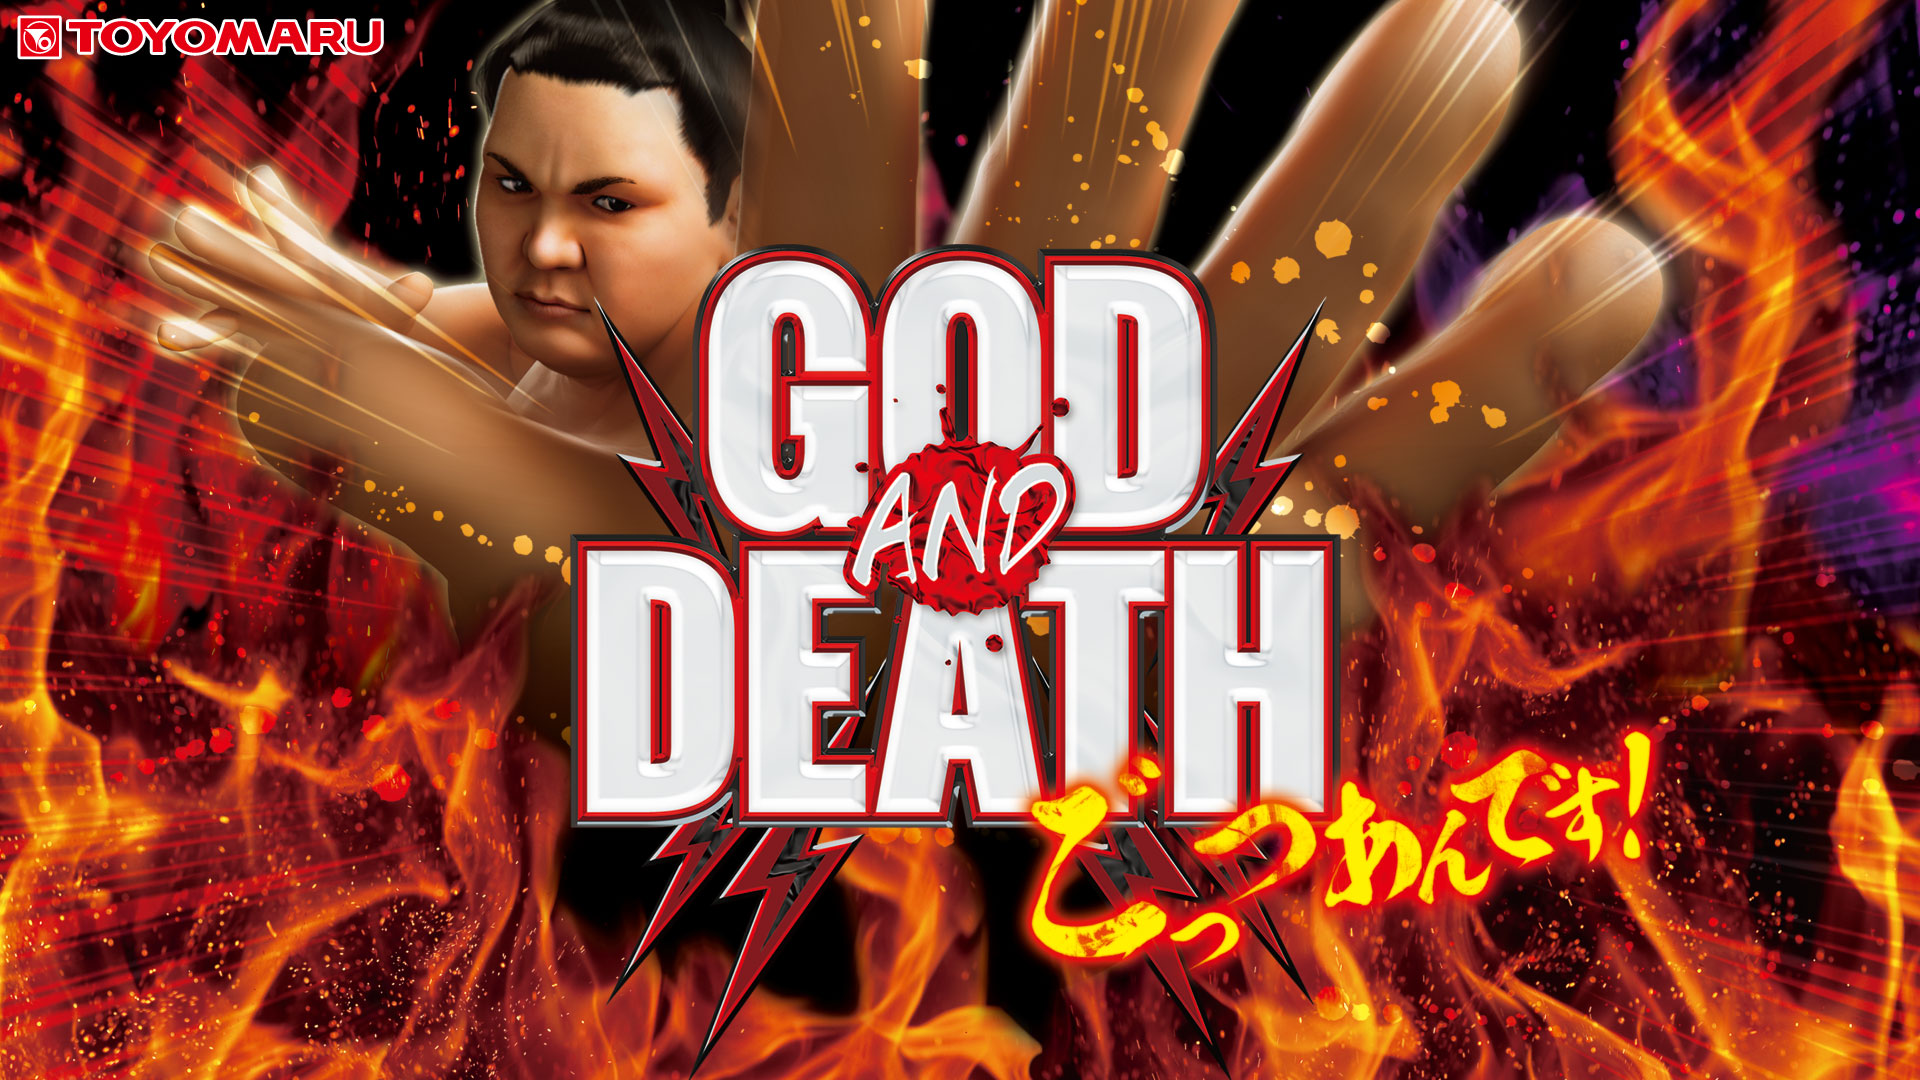 CR GOD AND DEATH | ダウンロード | TOYOMARUファン | 豊丸産業株式会社